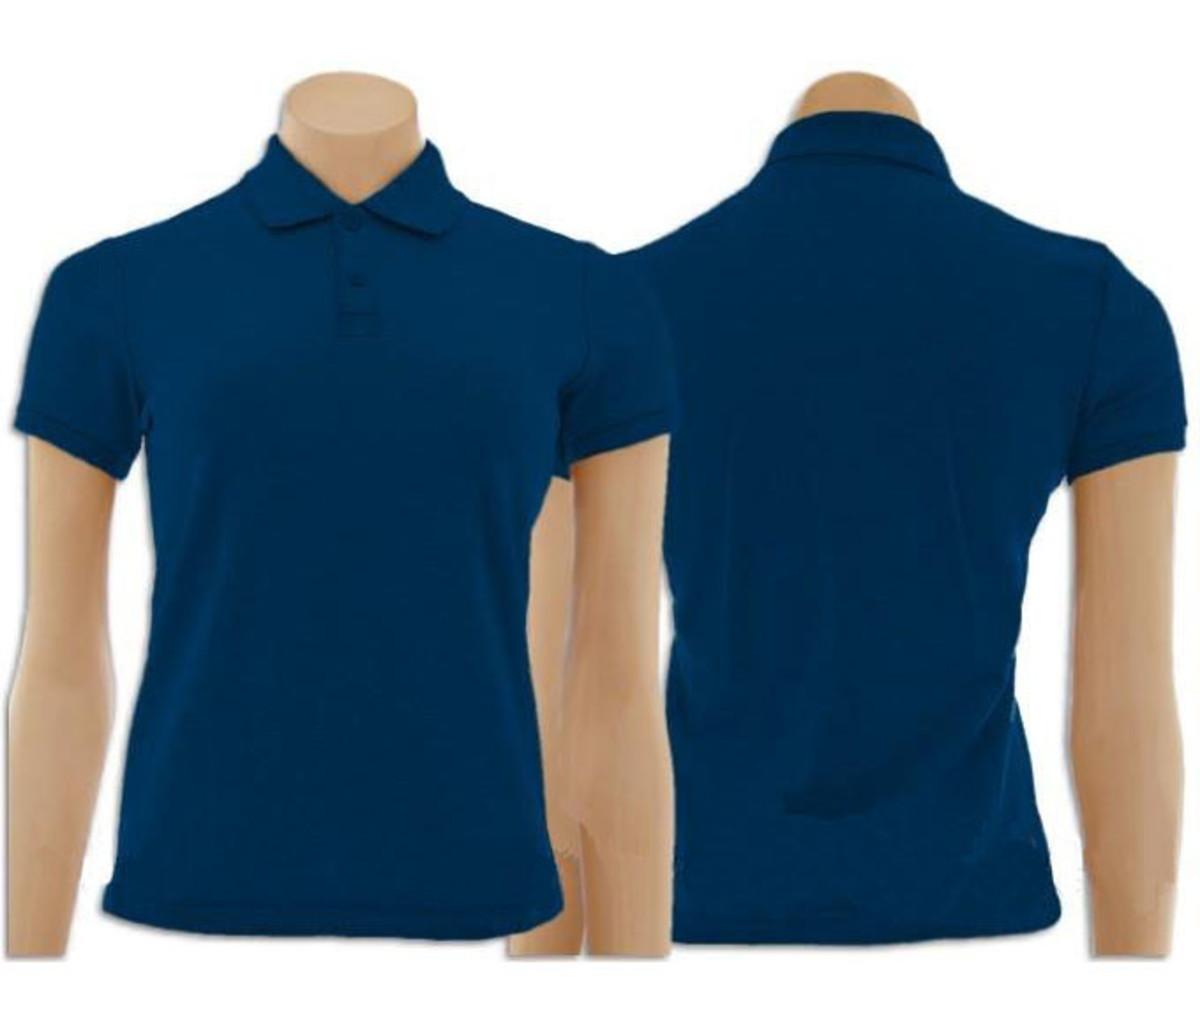 947eece490 Kit com 5 Camisetas Gola Polo Feminino no Elo7